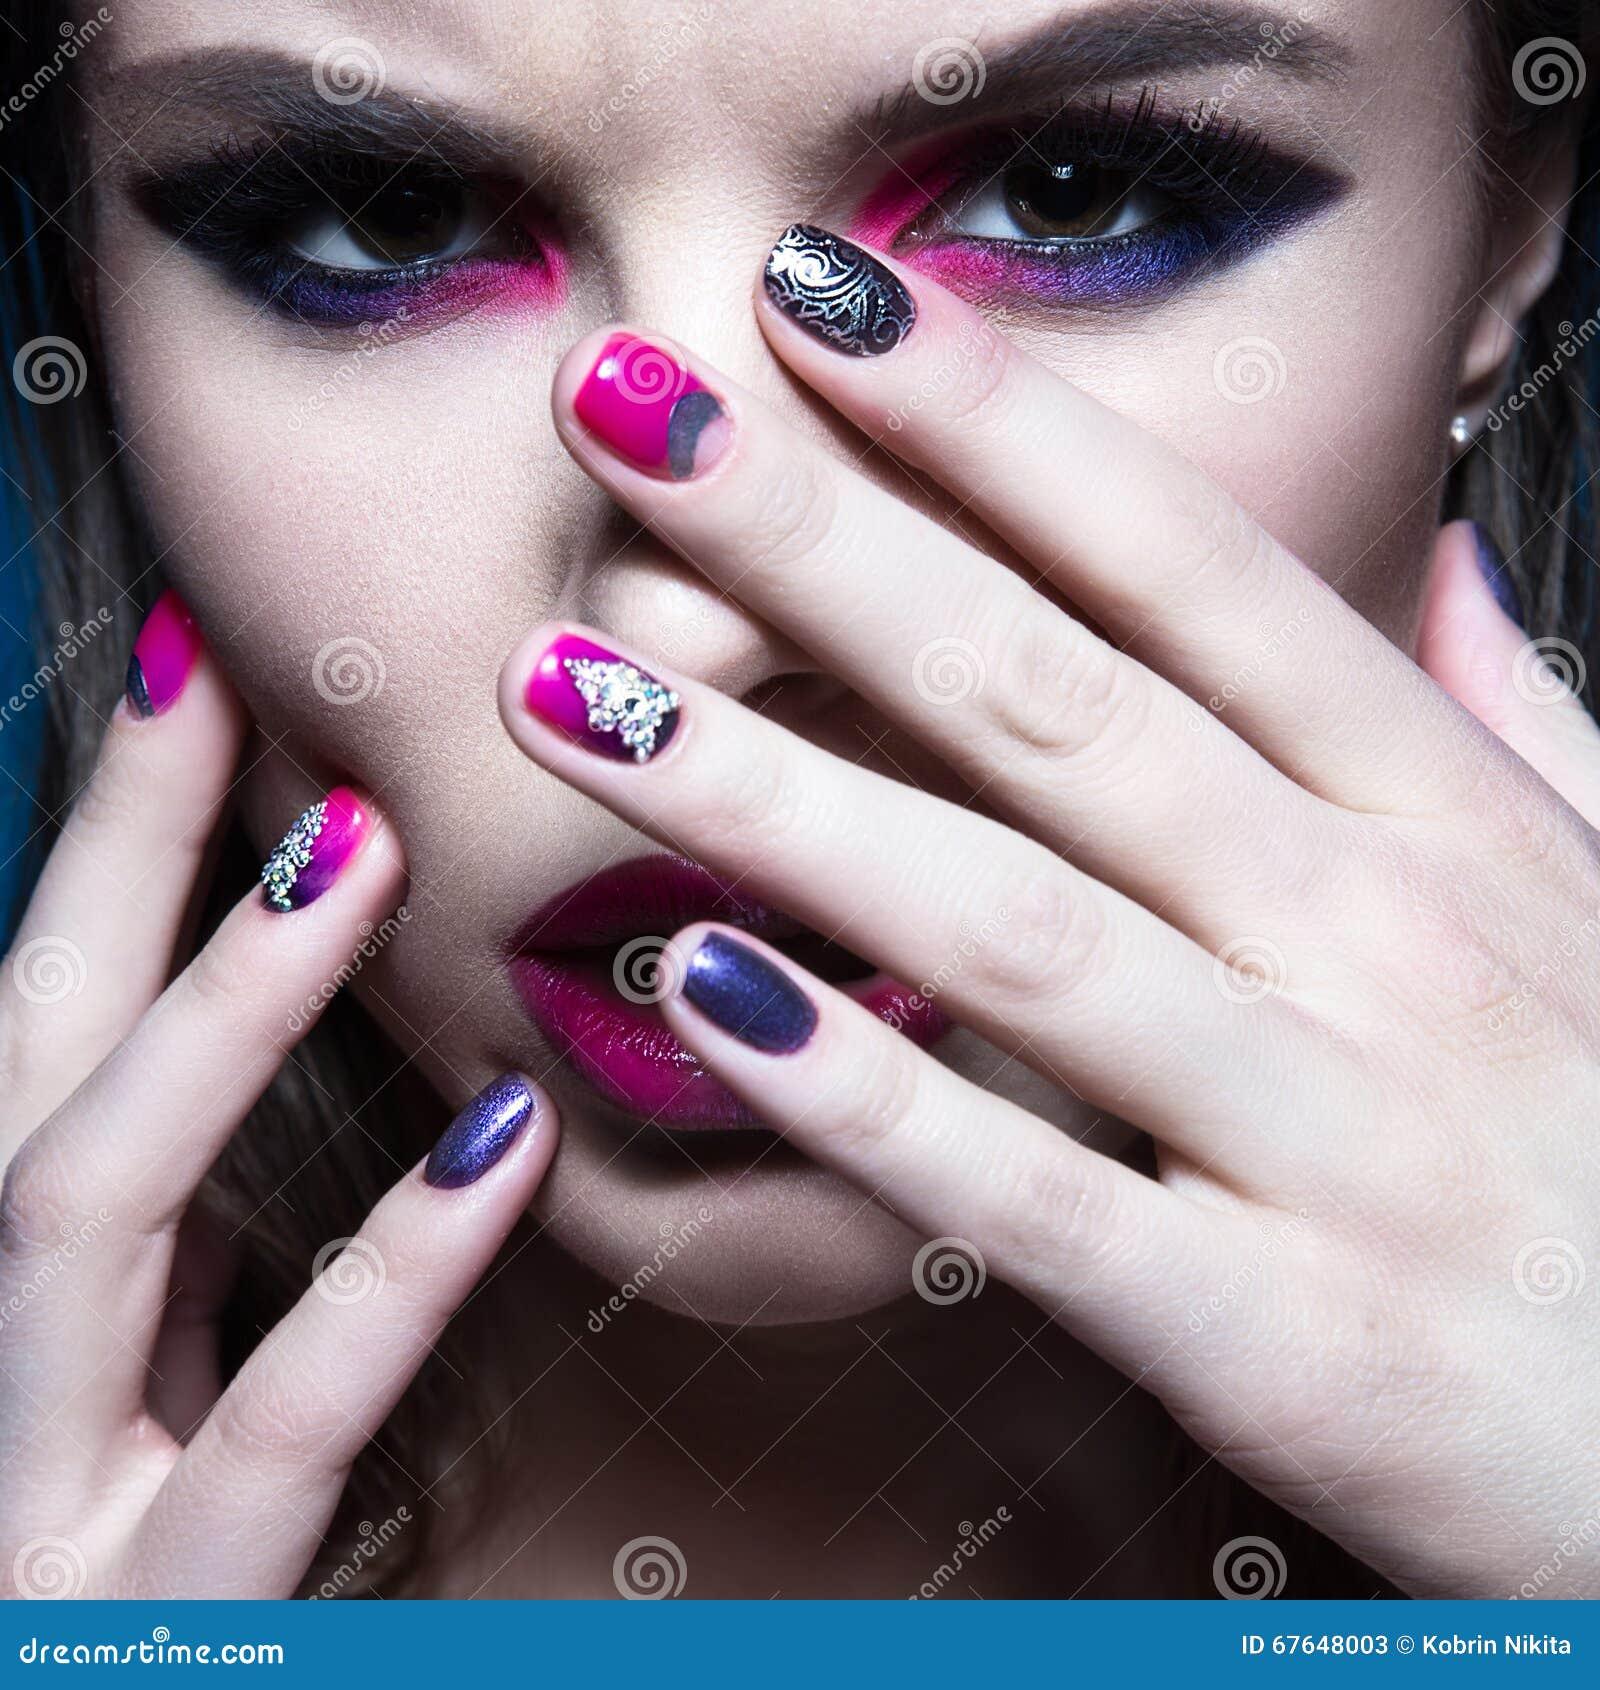 Beautiful Girl With Bright Creative Fashion Makeup And Colorful Nail Polish. Art Beauty Design ...